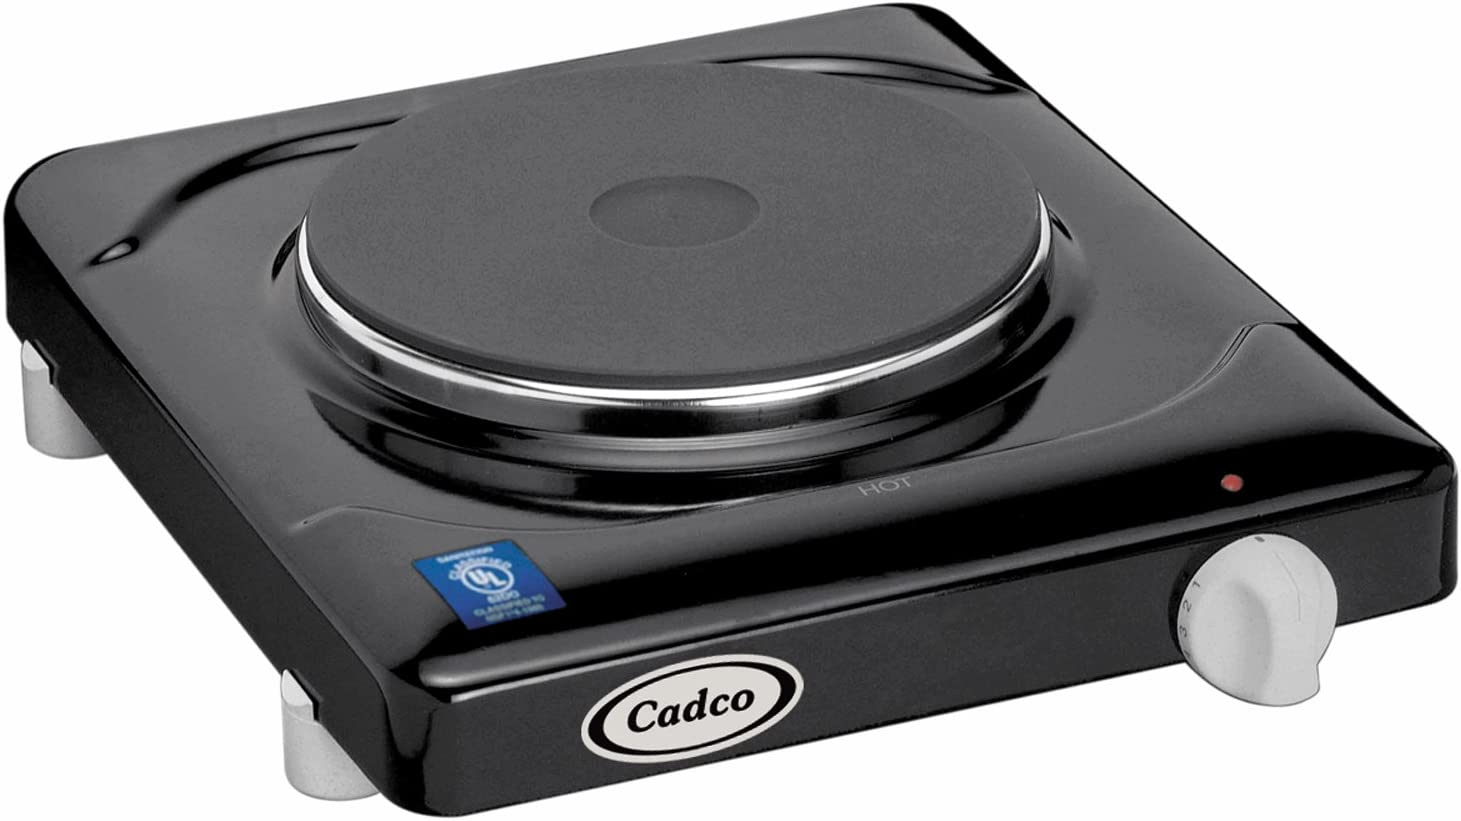 Cadco KR-1 Portable Cast Iron Hot Plate, 120-Volt